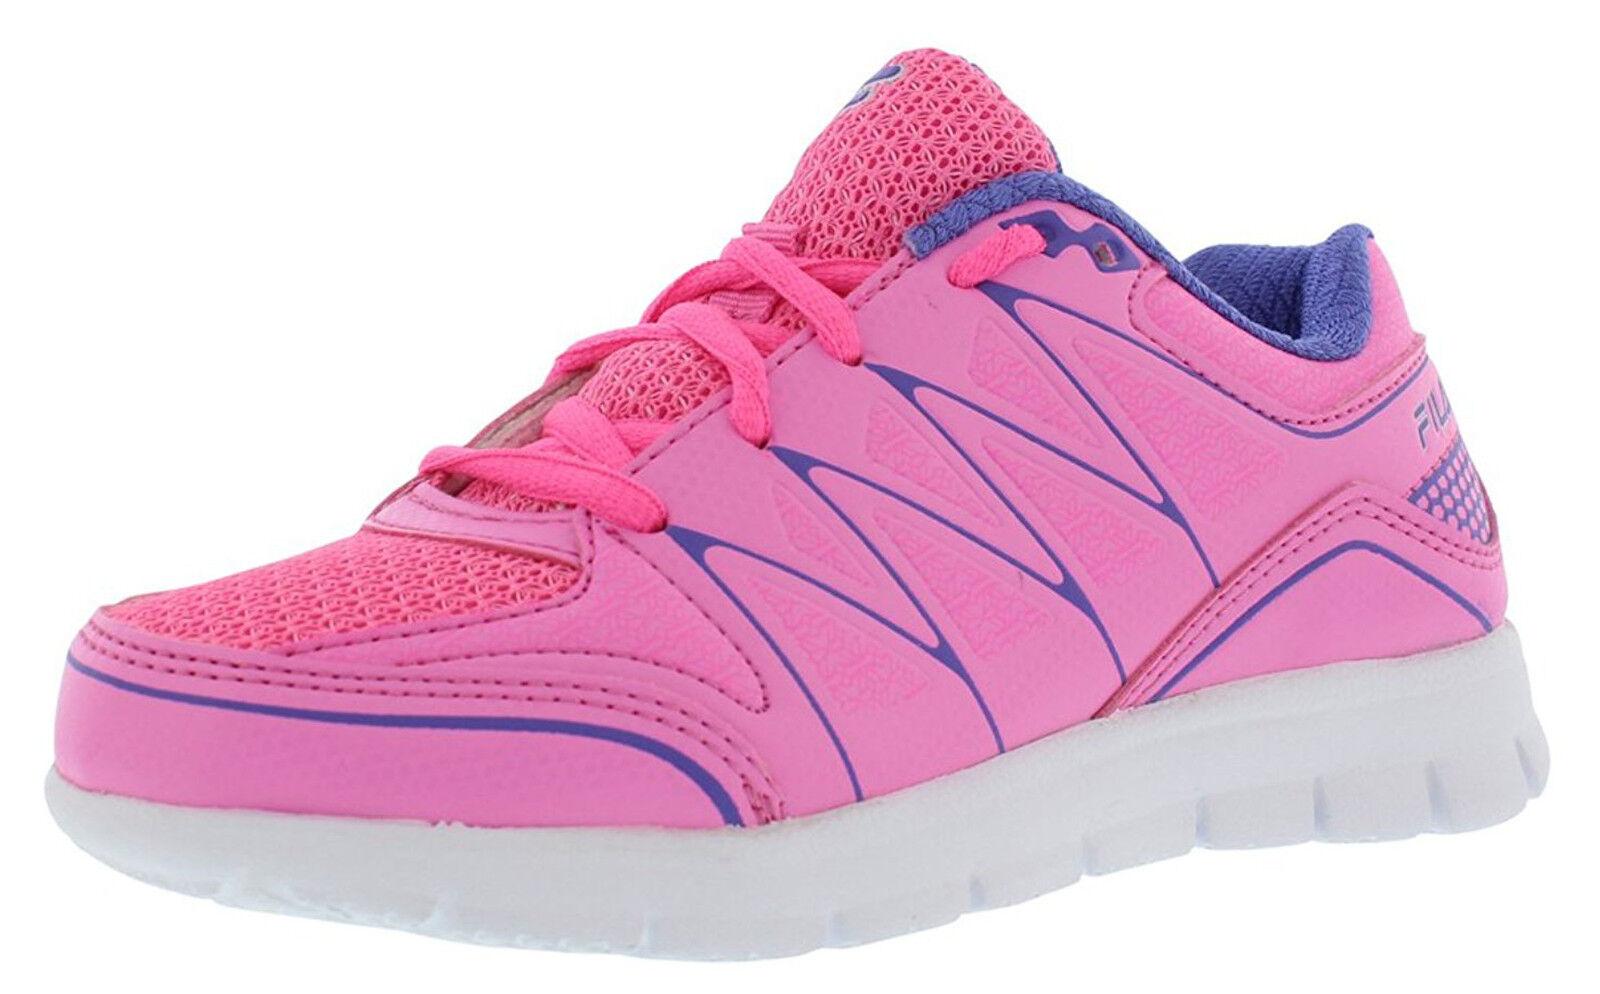 9907fd1e6cb1 FILA Thunderbolt 2 Running Kid s Shoes Size 2 2